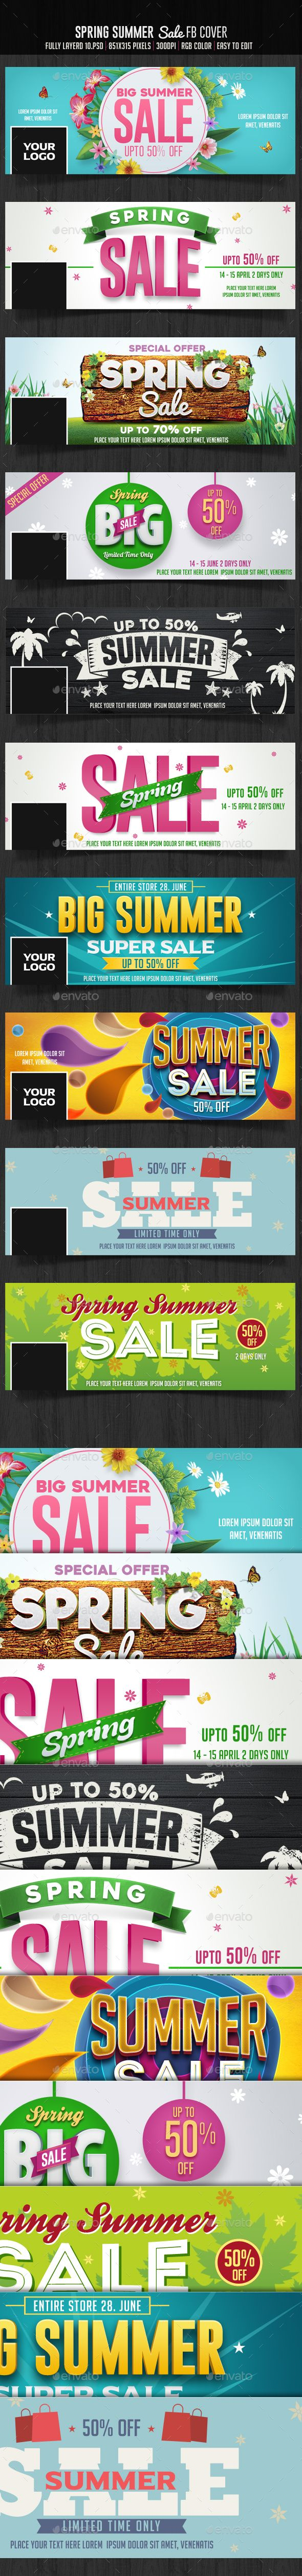 10 Spring Summer Sale Facebook Cover